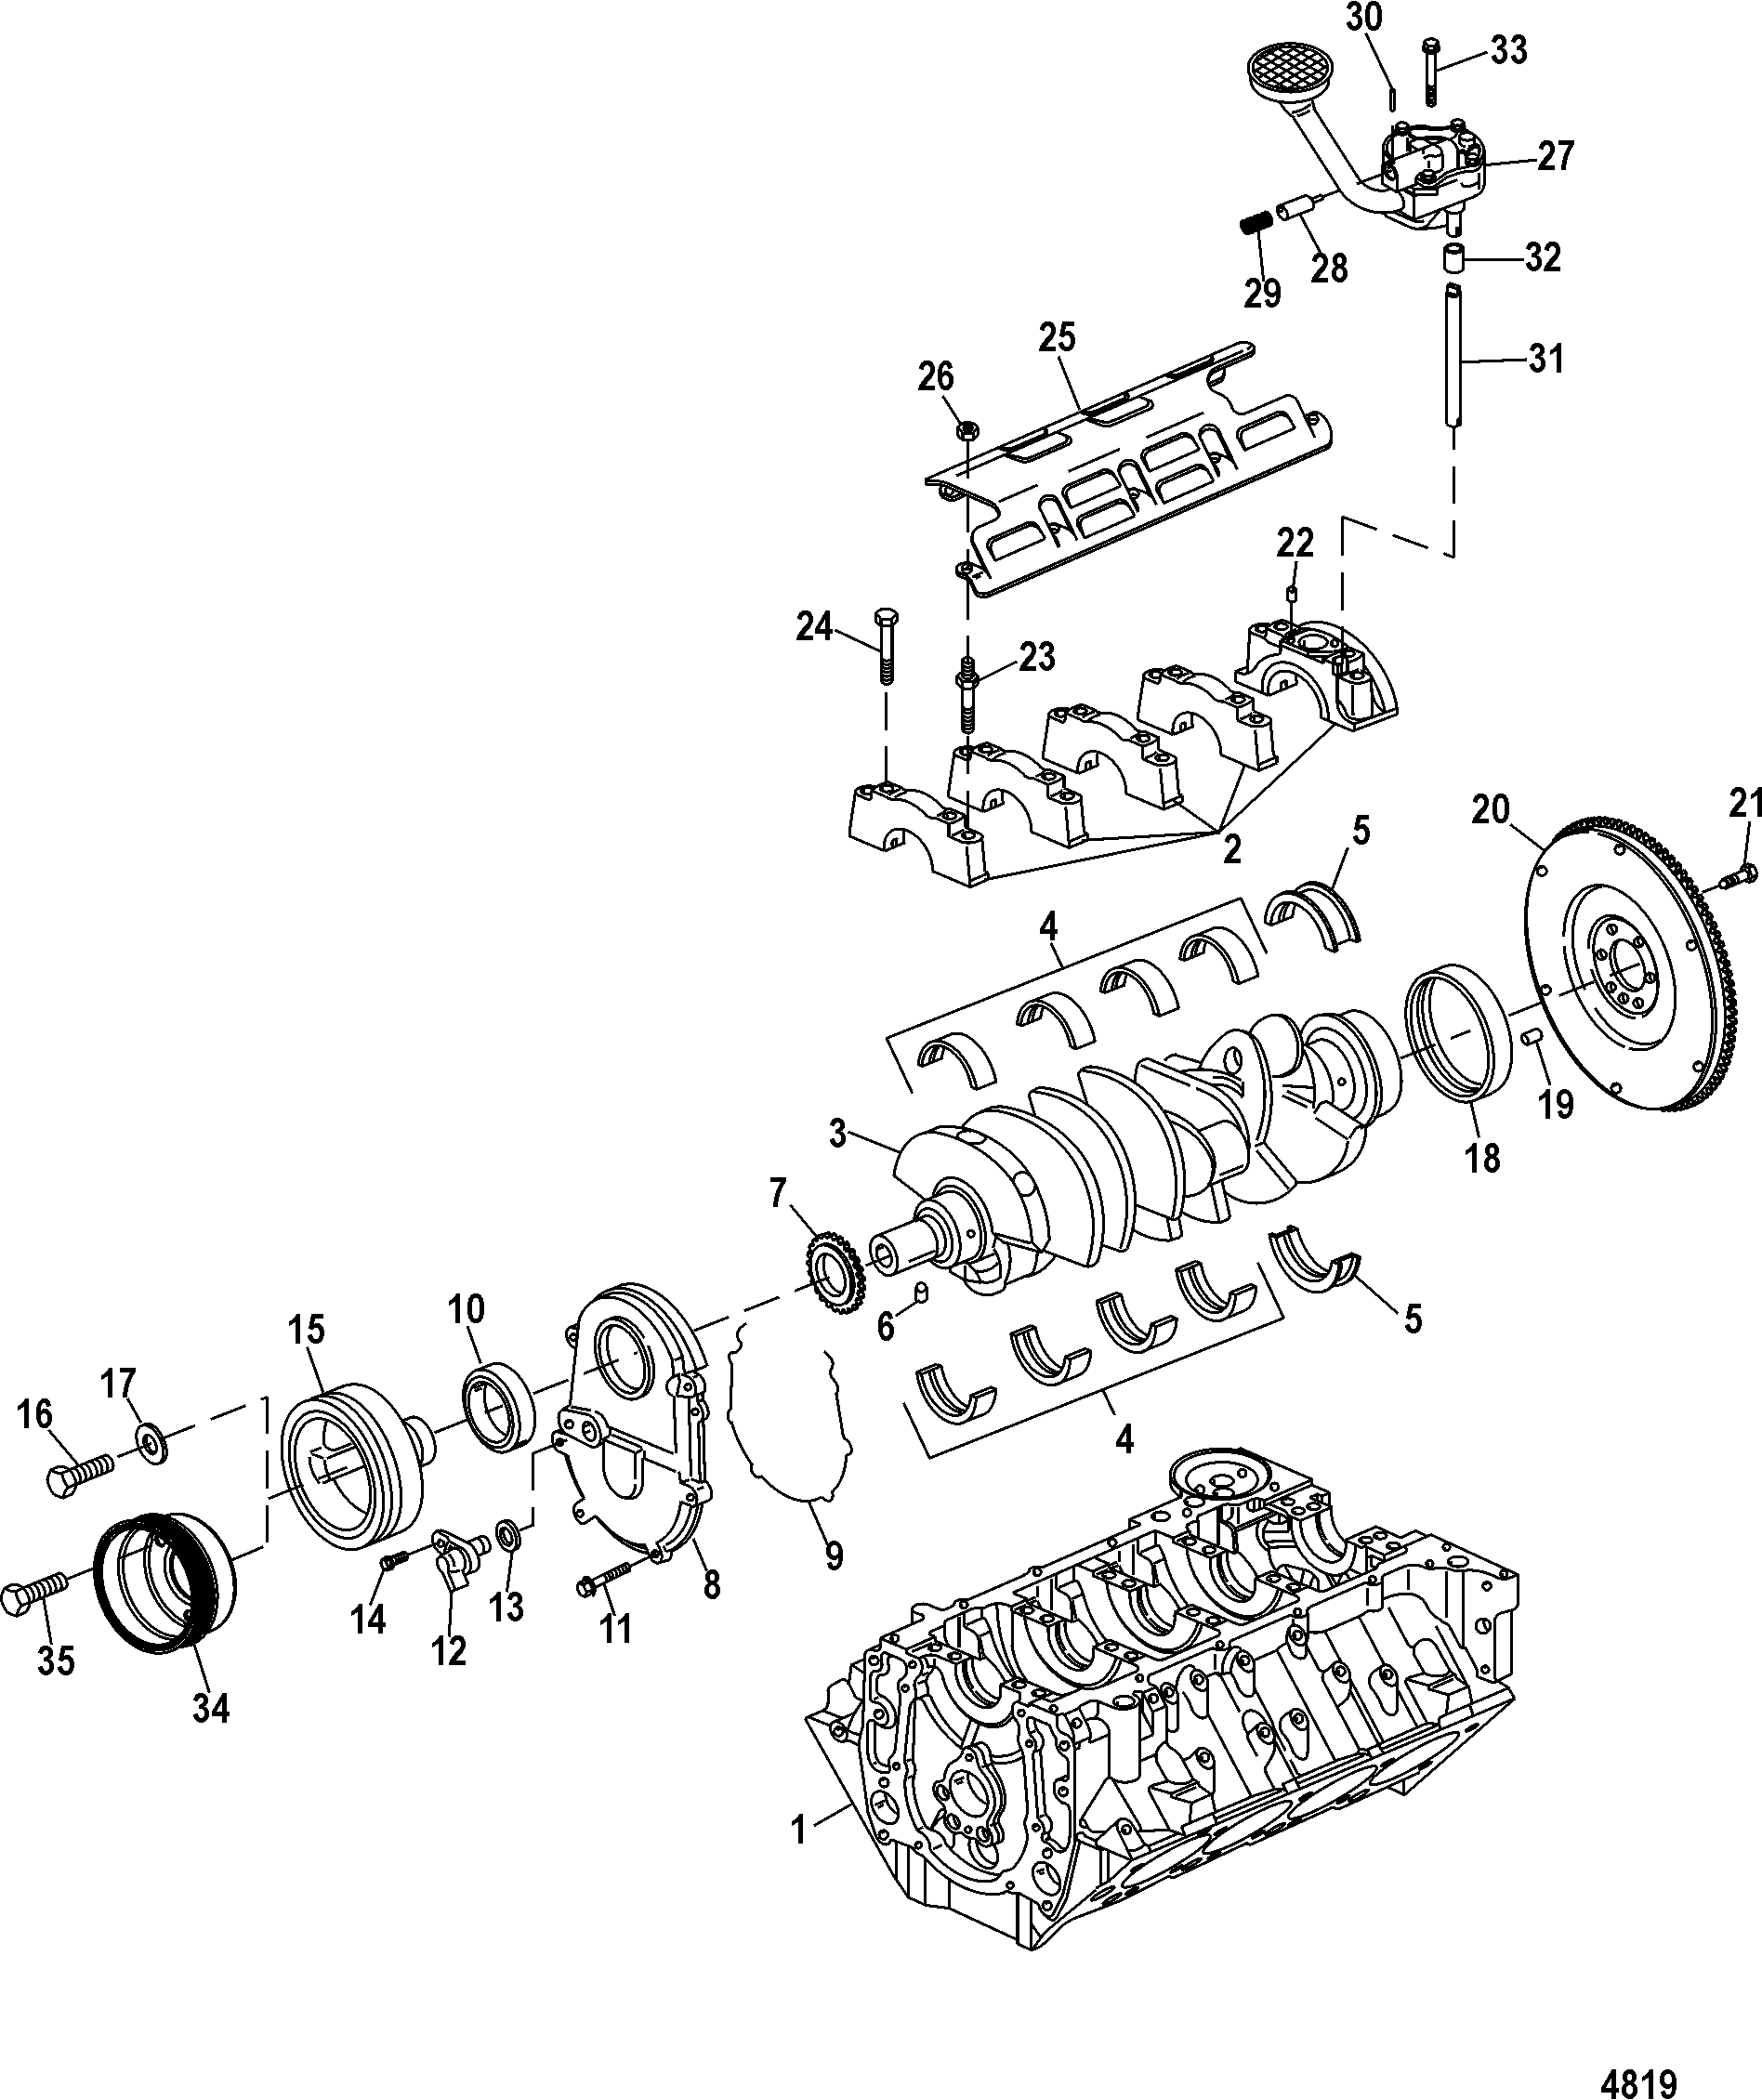 Cp Performance Block Crankshaft Oil Pump And Front Cover